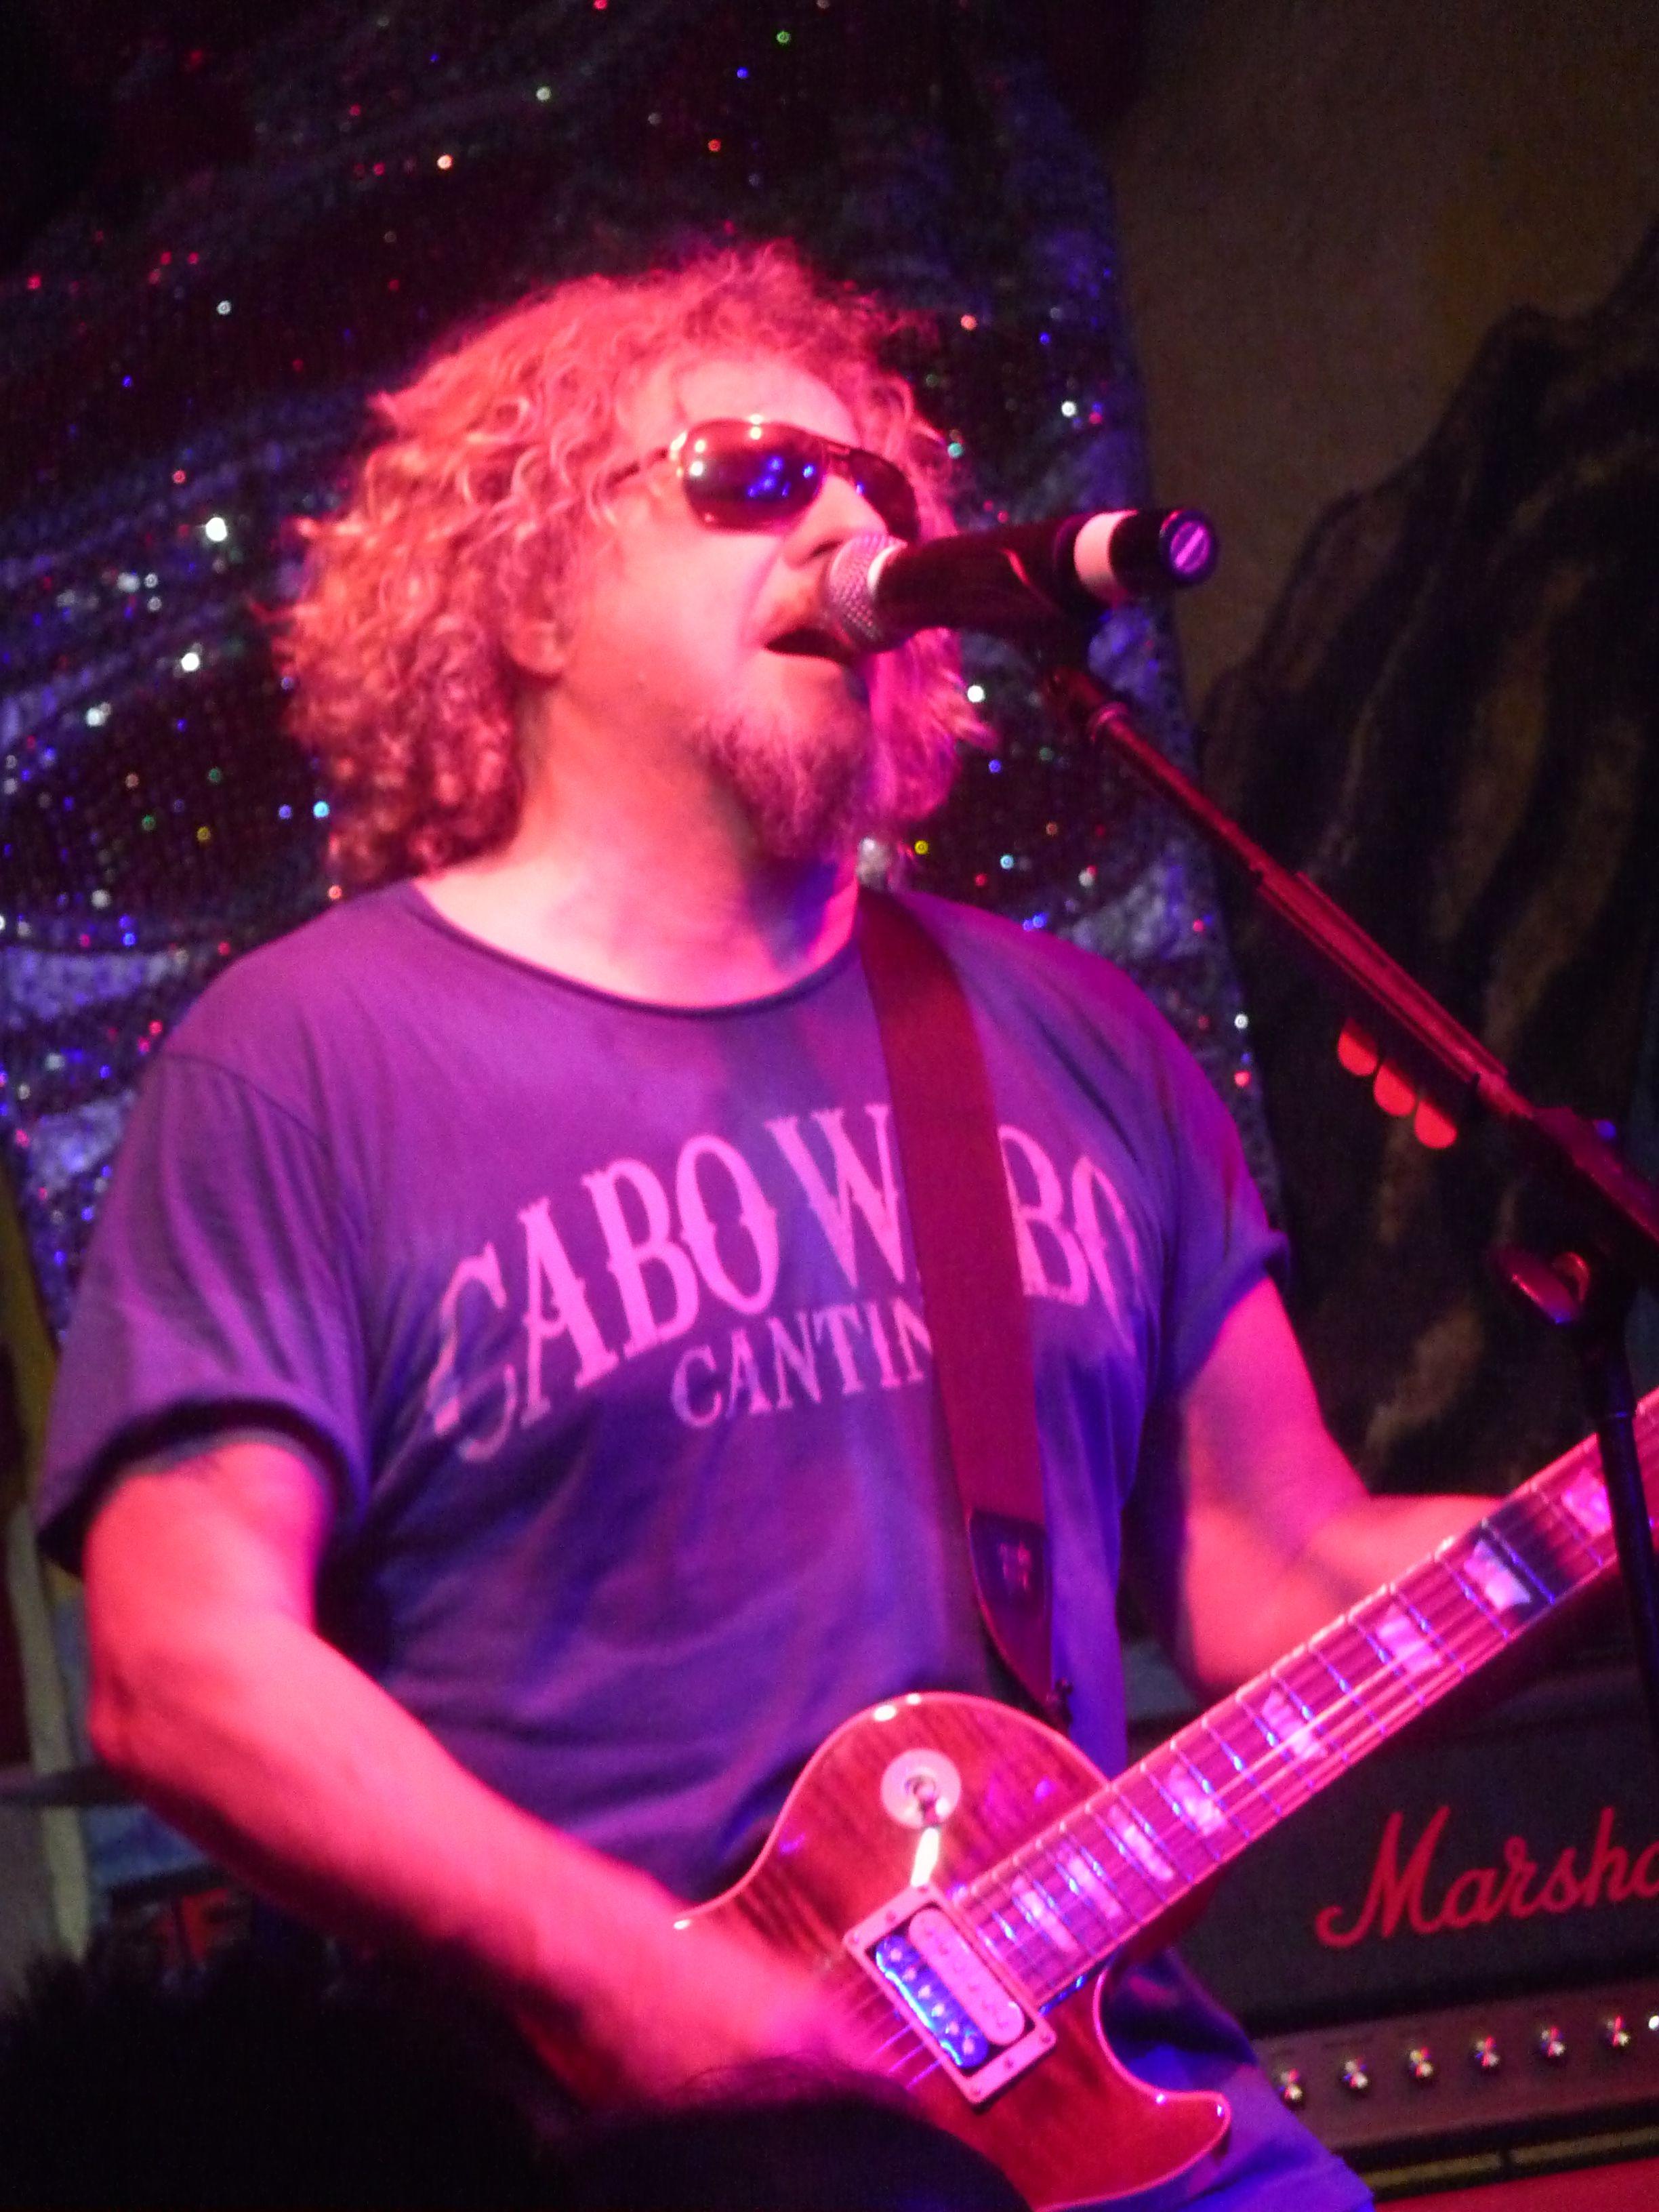 Sammy Hagar At His Cabo Wabo Catina During His 63rd Annual Birthday Bash Sammy Hagar Red Rocker Van Halen